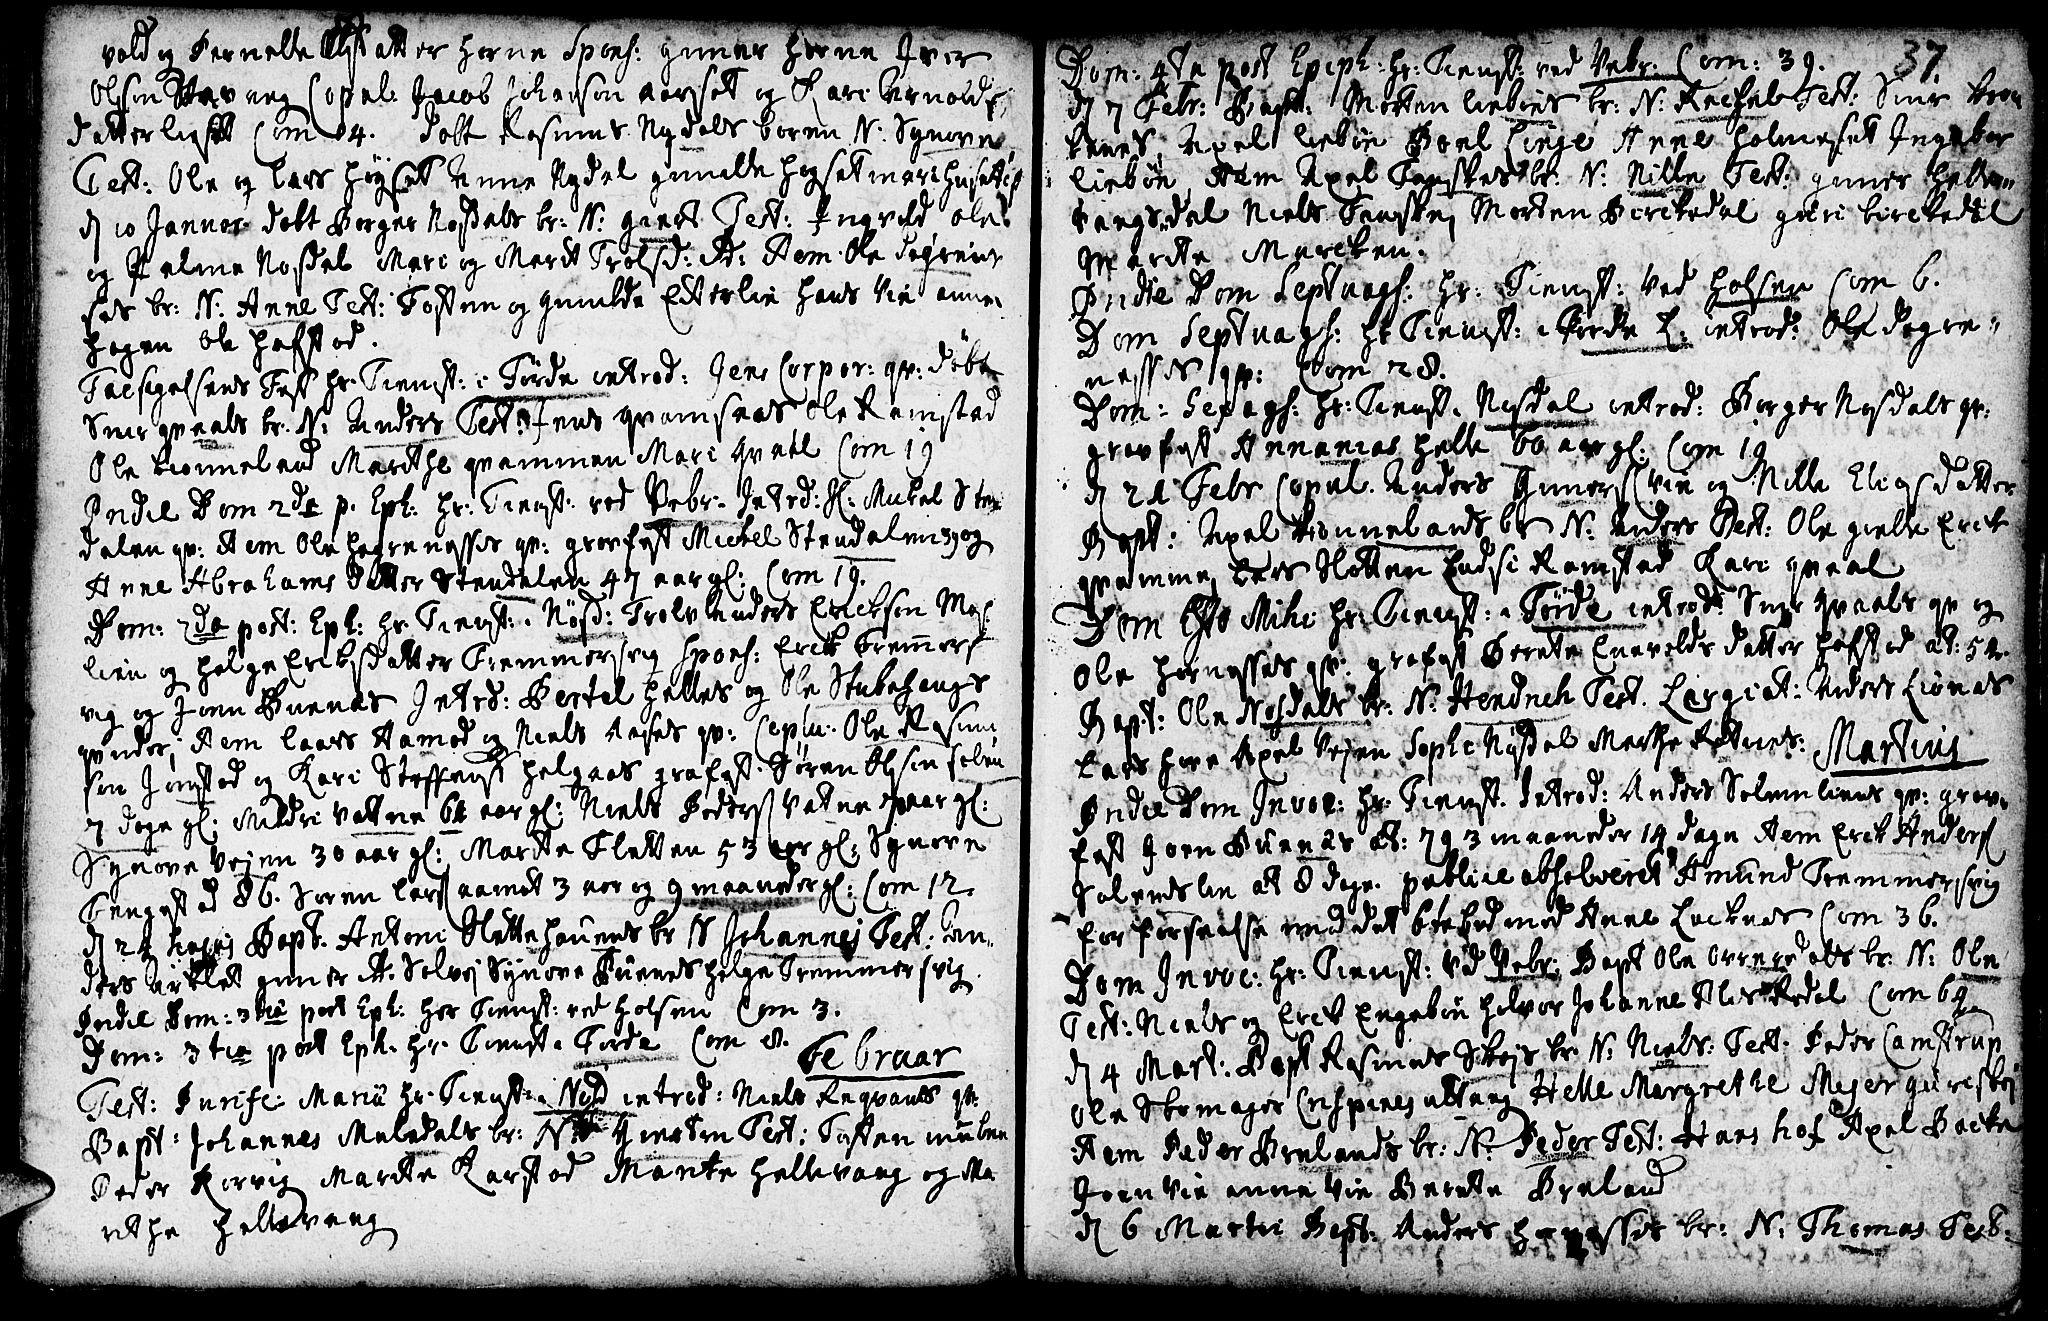 SAB, Førde sokneprestembete, H/Haa: Ministerialbok nr. A 2, 1728-1748, s. 37